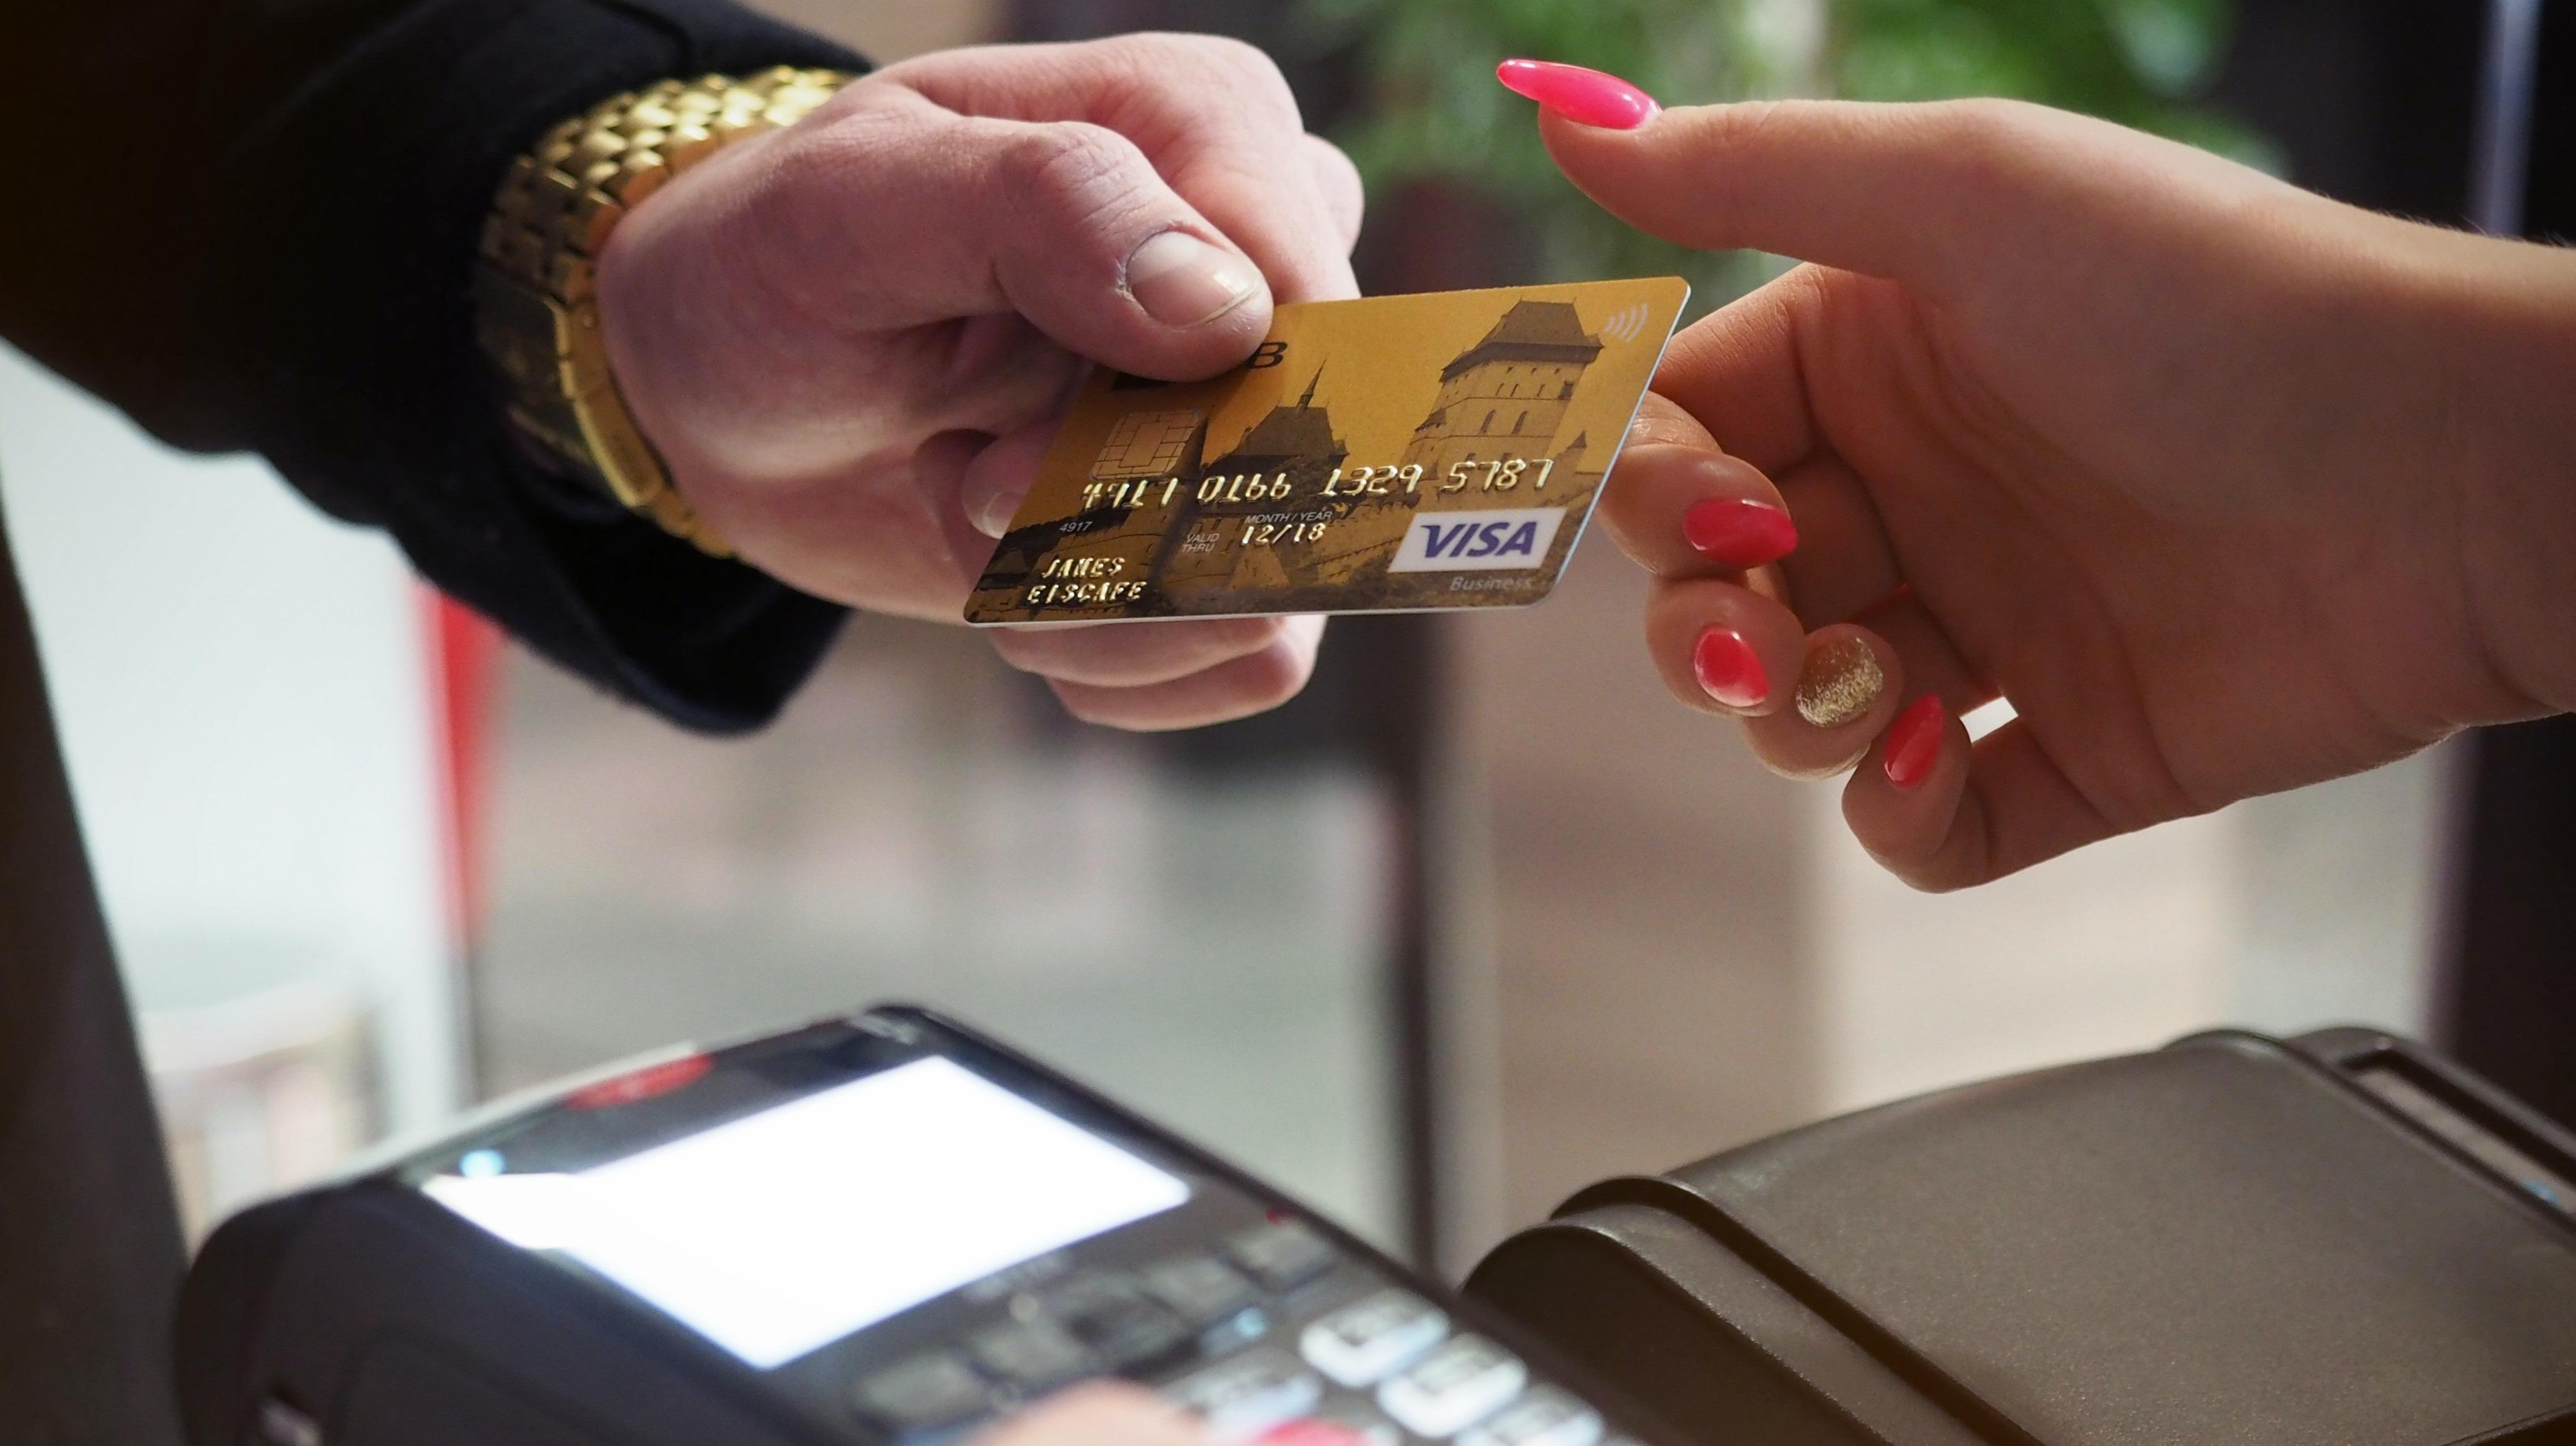 Bitcoin Rewards Credit Cards